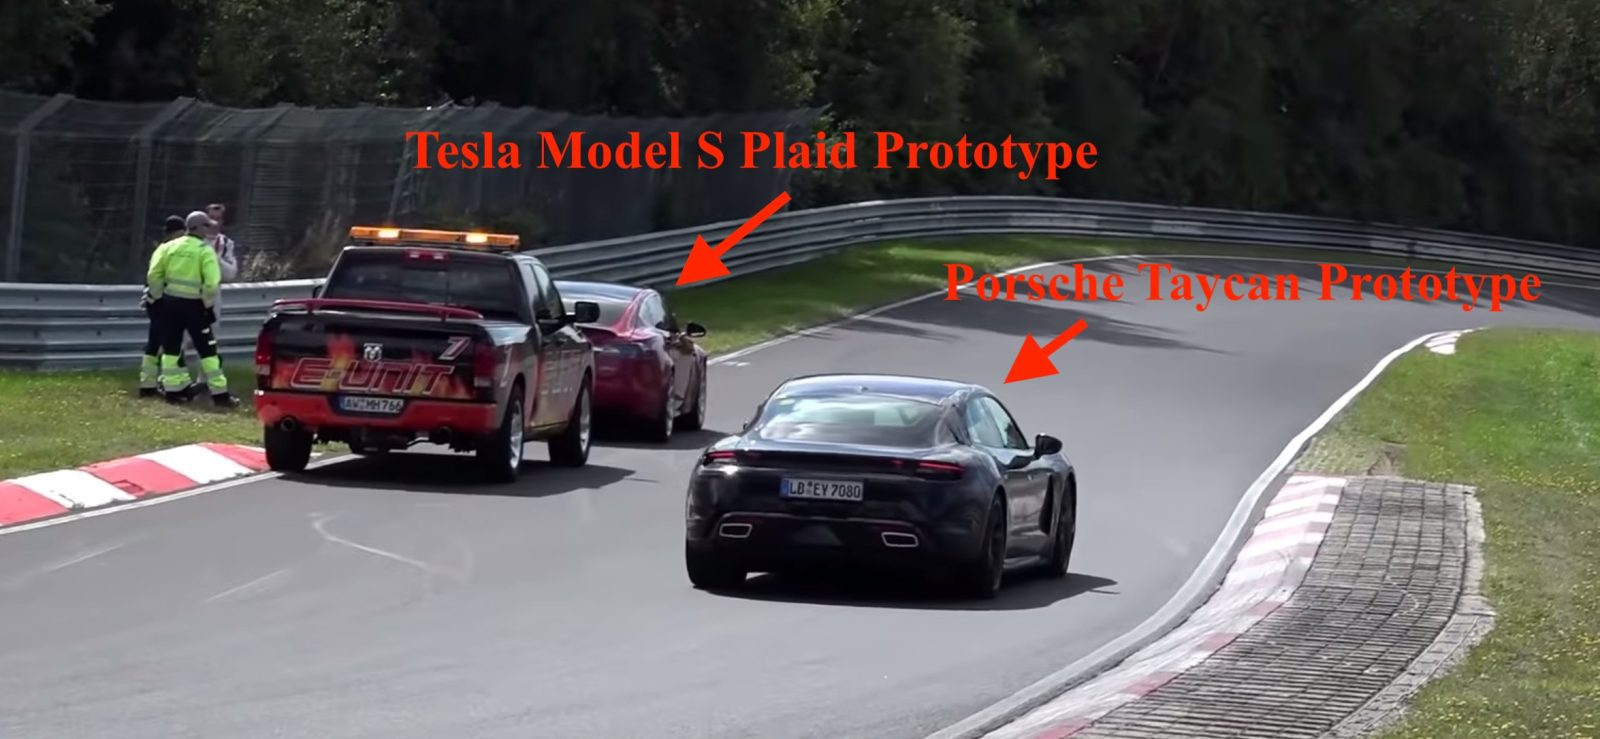 porsche taycan vs tesla model s